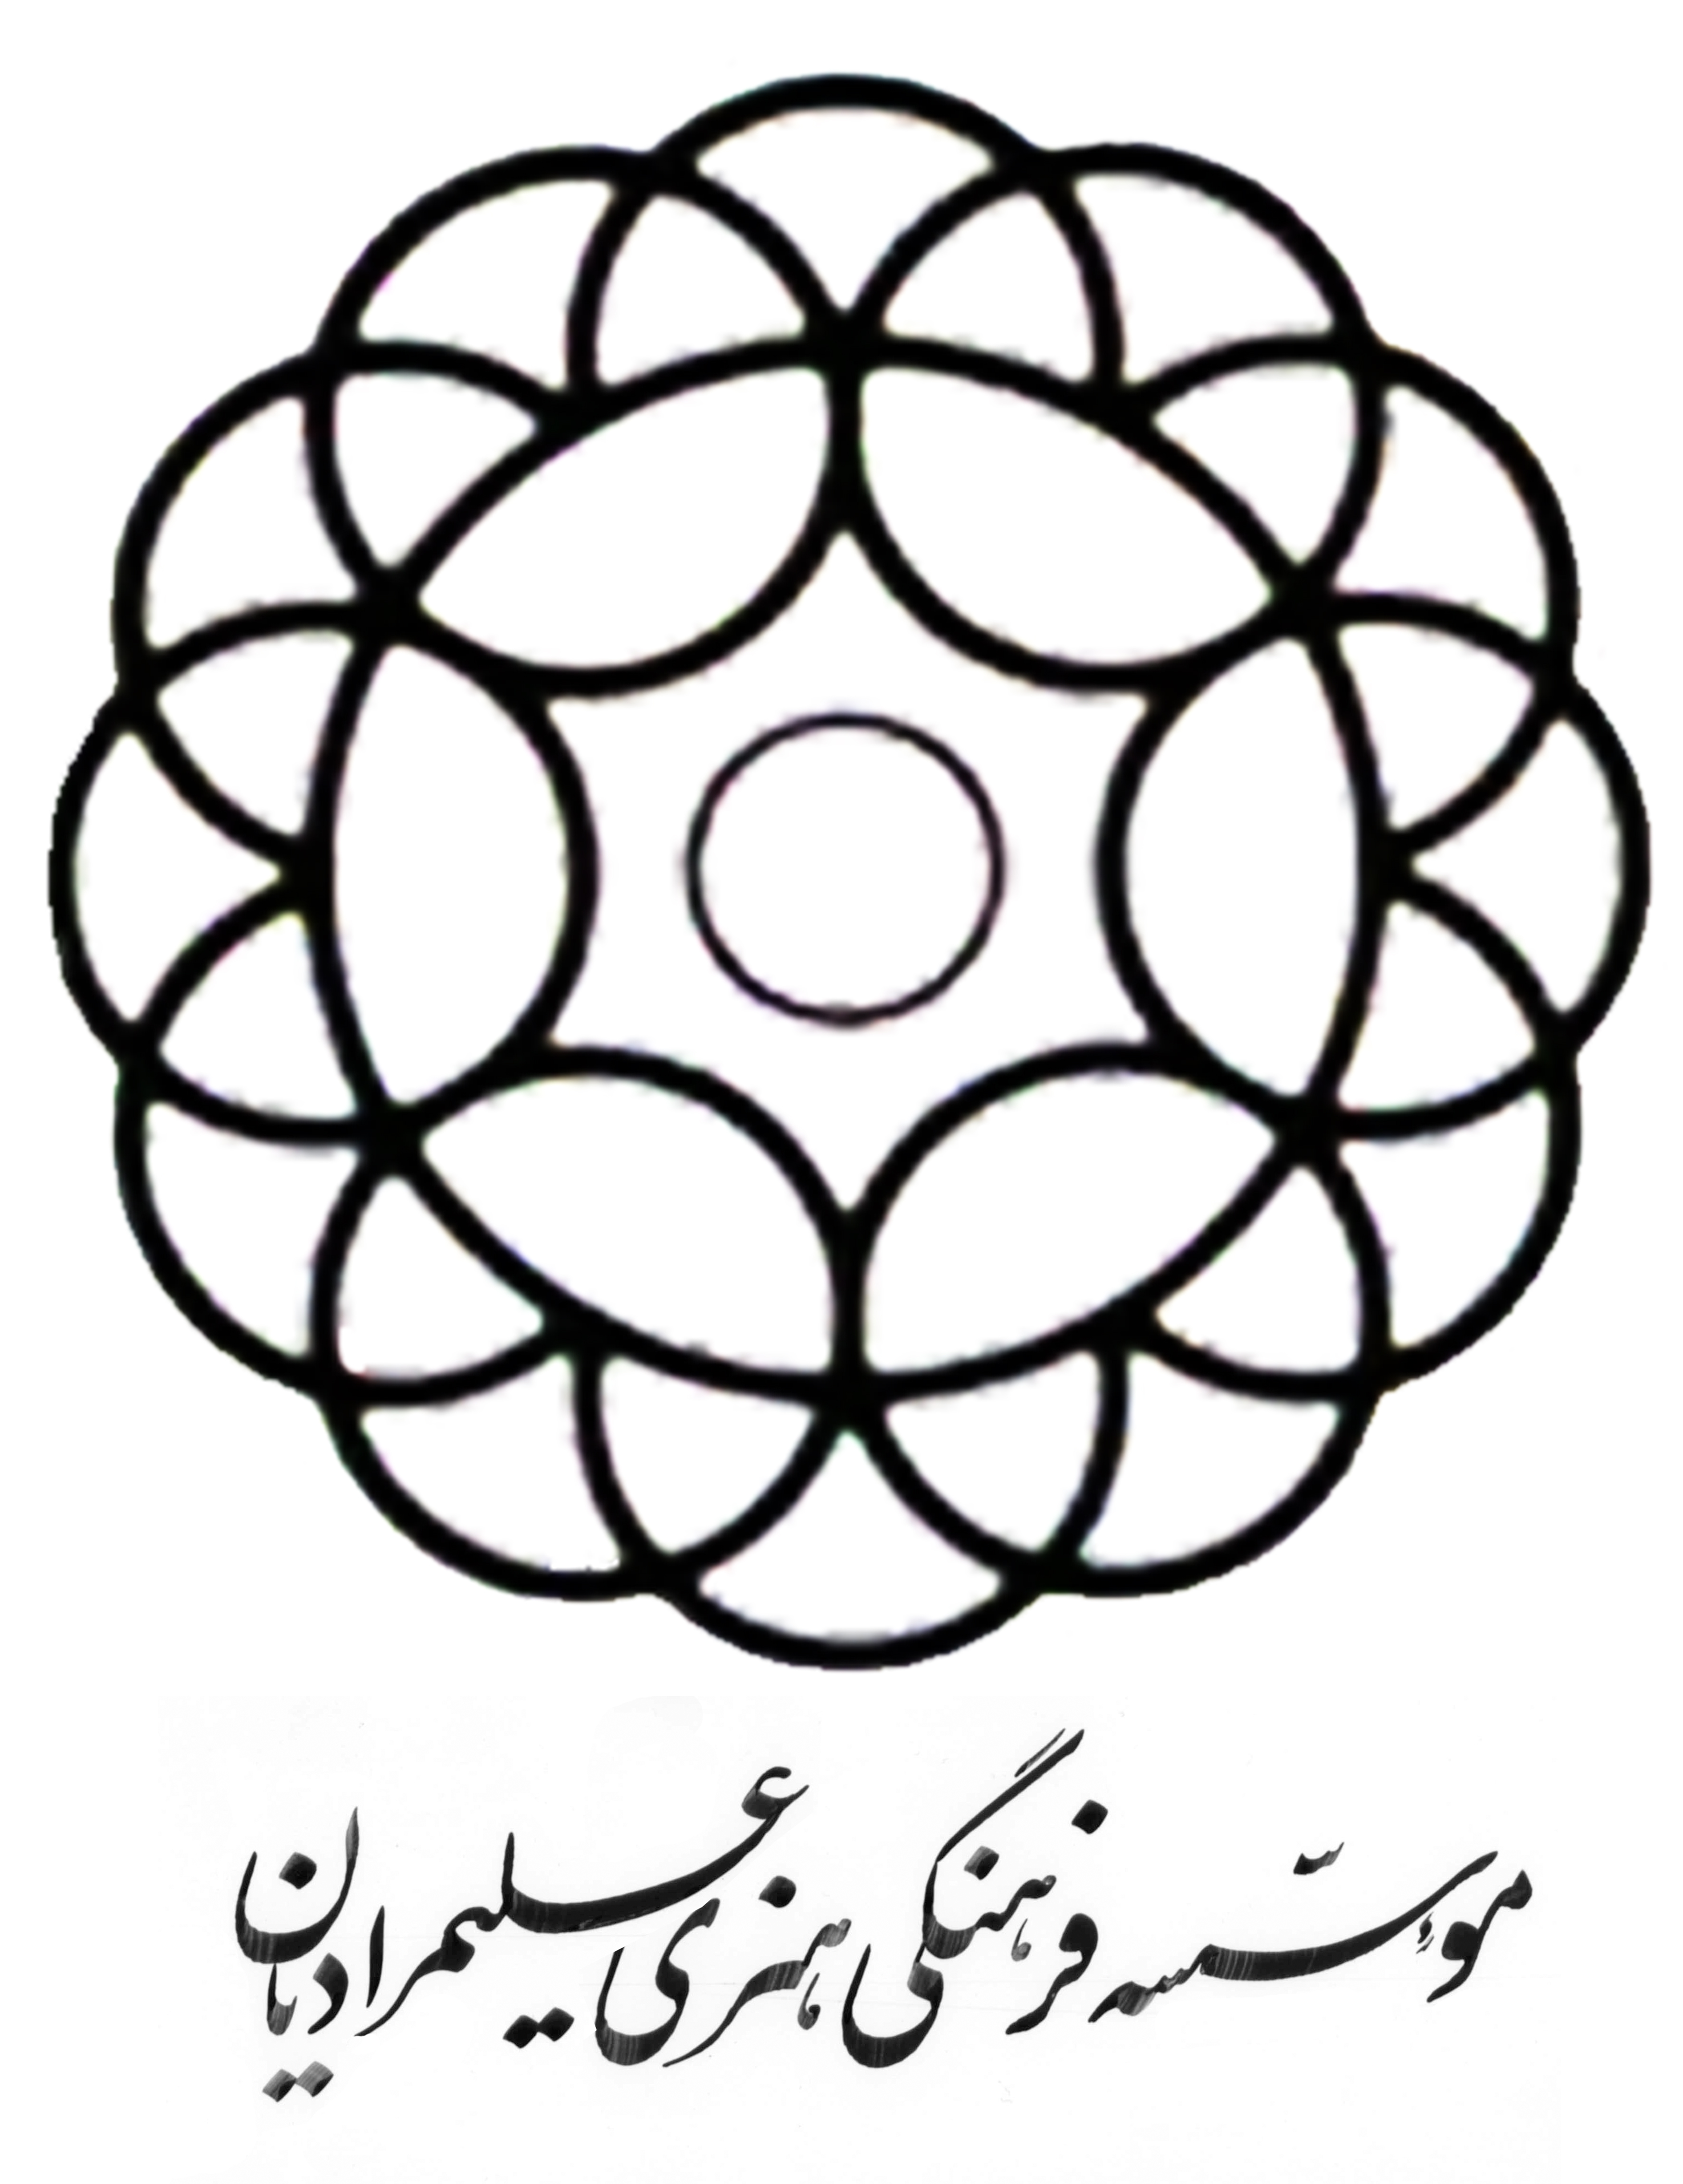 کانال تلگرام موسسه فرهنگی علیمرادیان